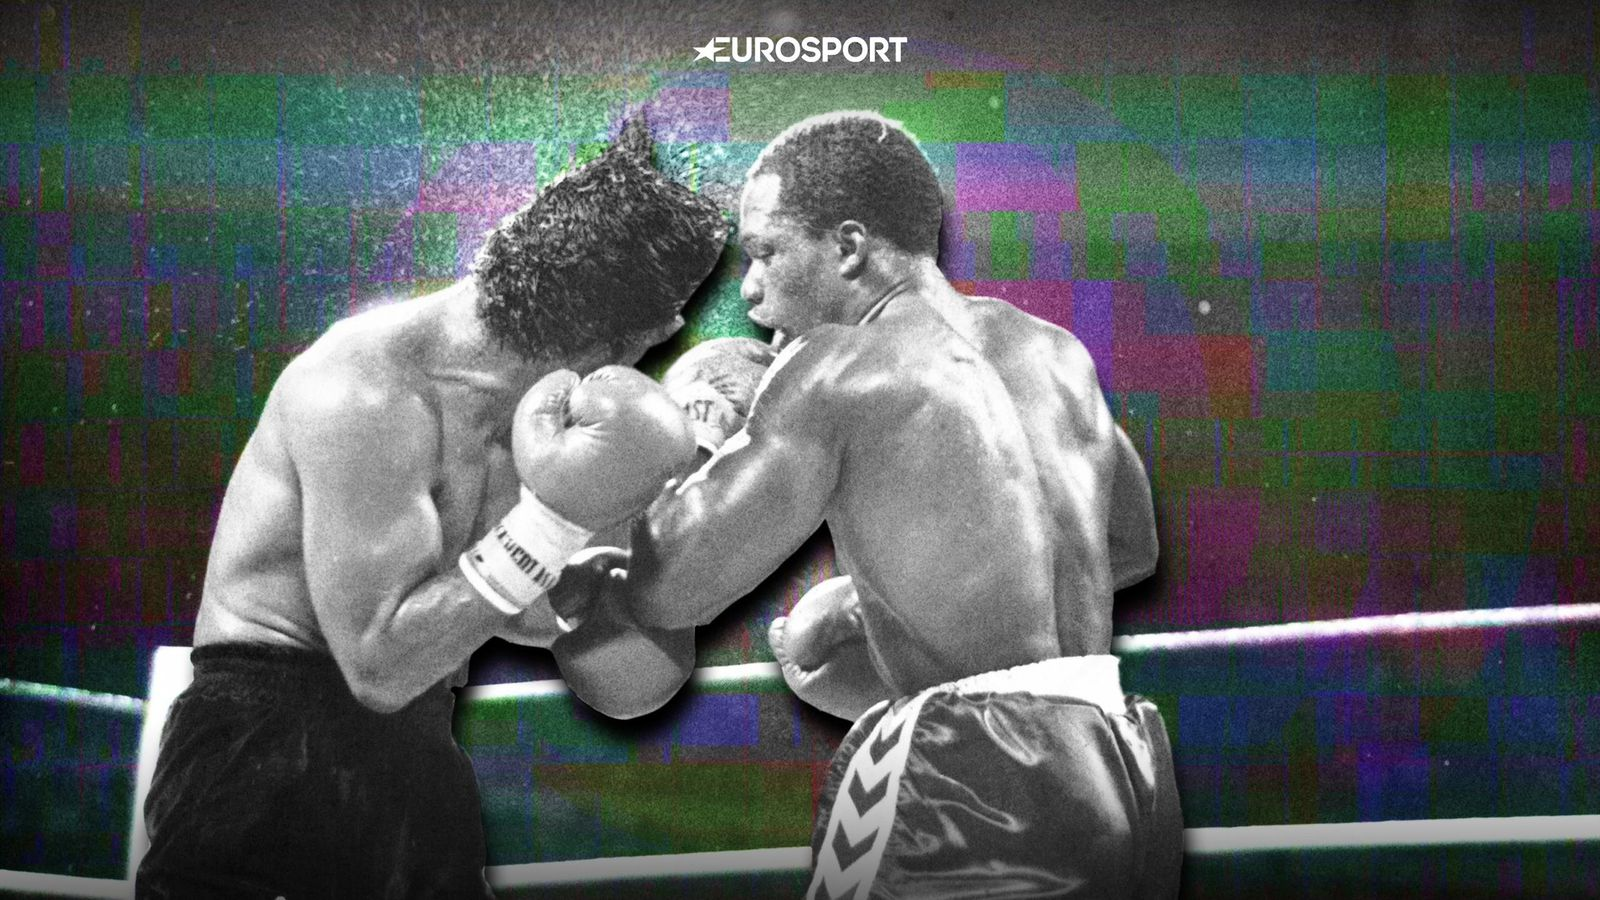 © Eurosport